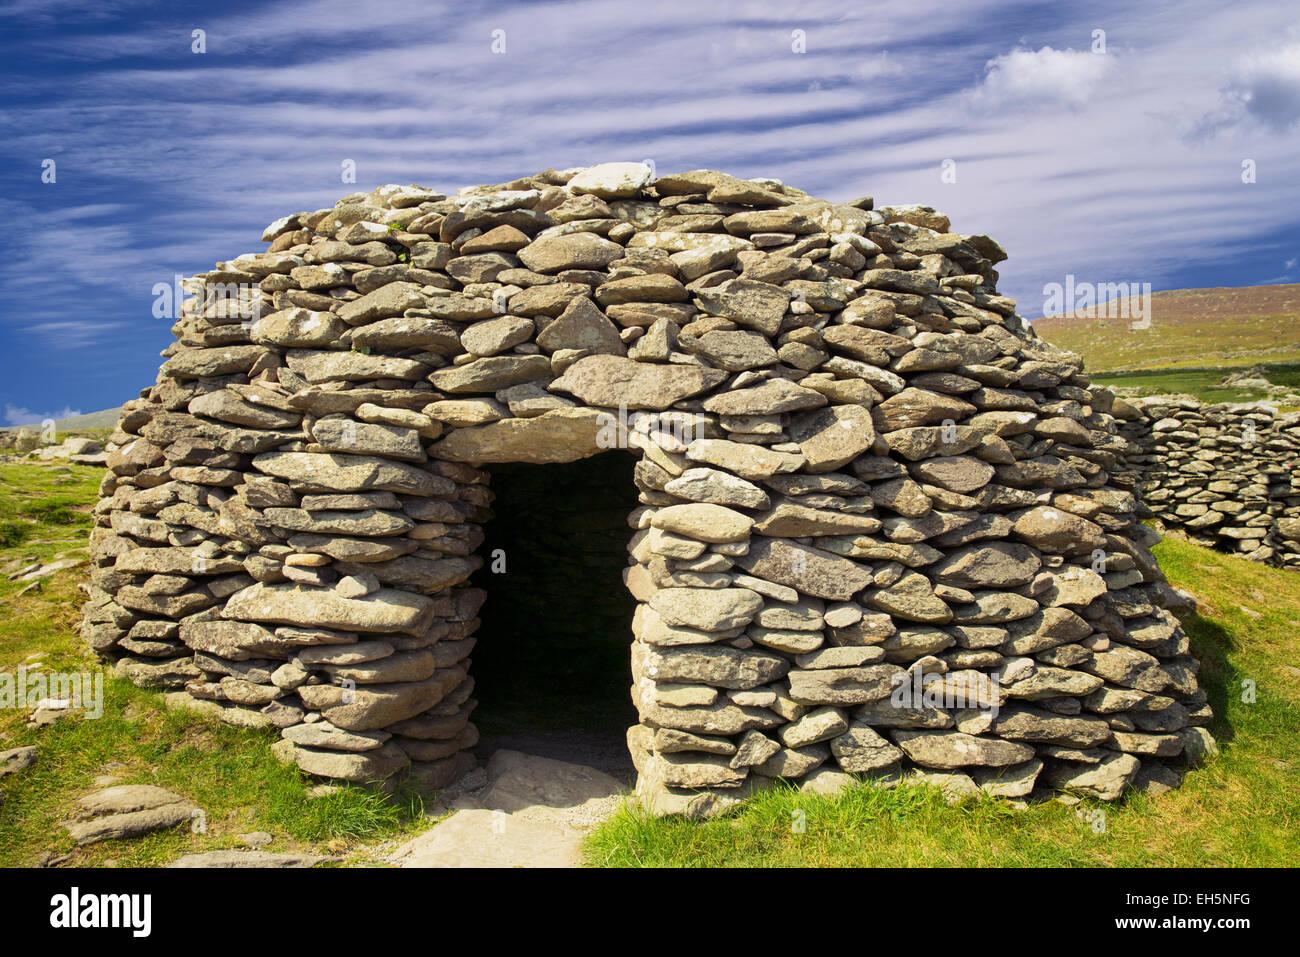 Beehive Hut. Penisola di Dingle, Irlanda Immagini Stock